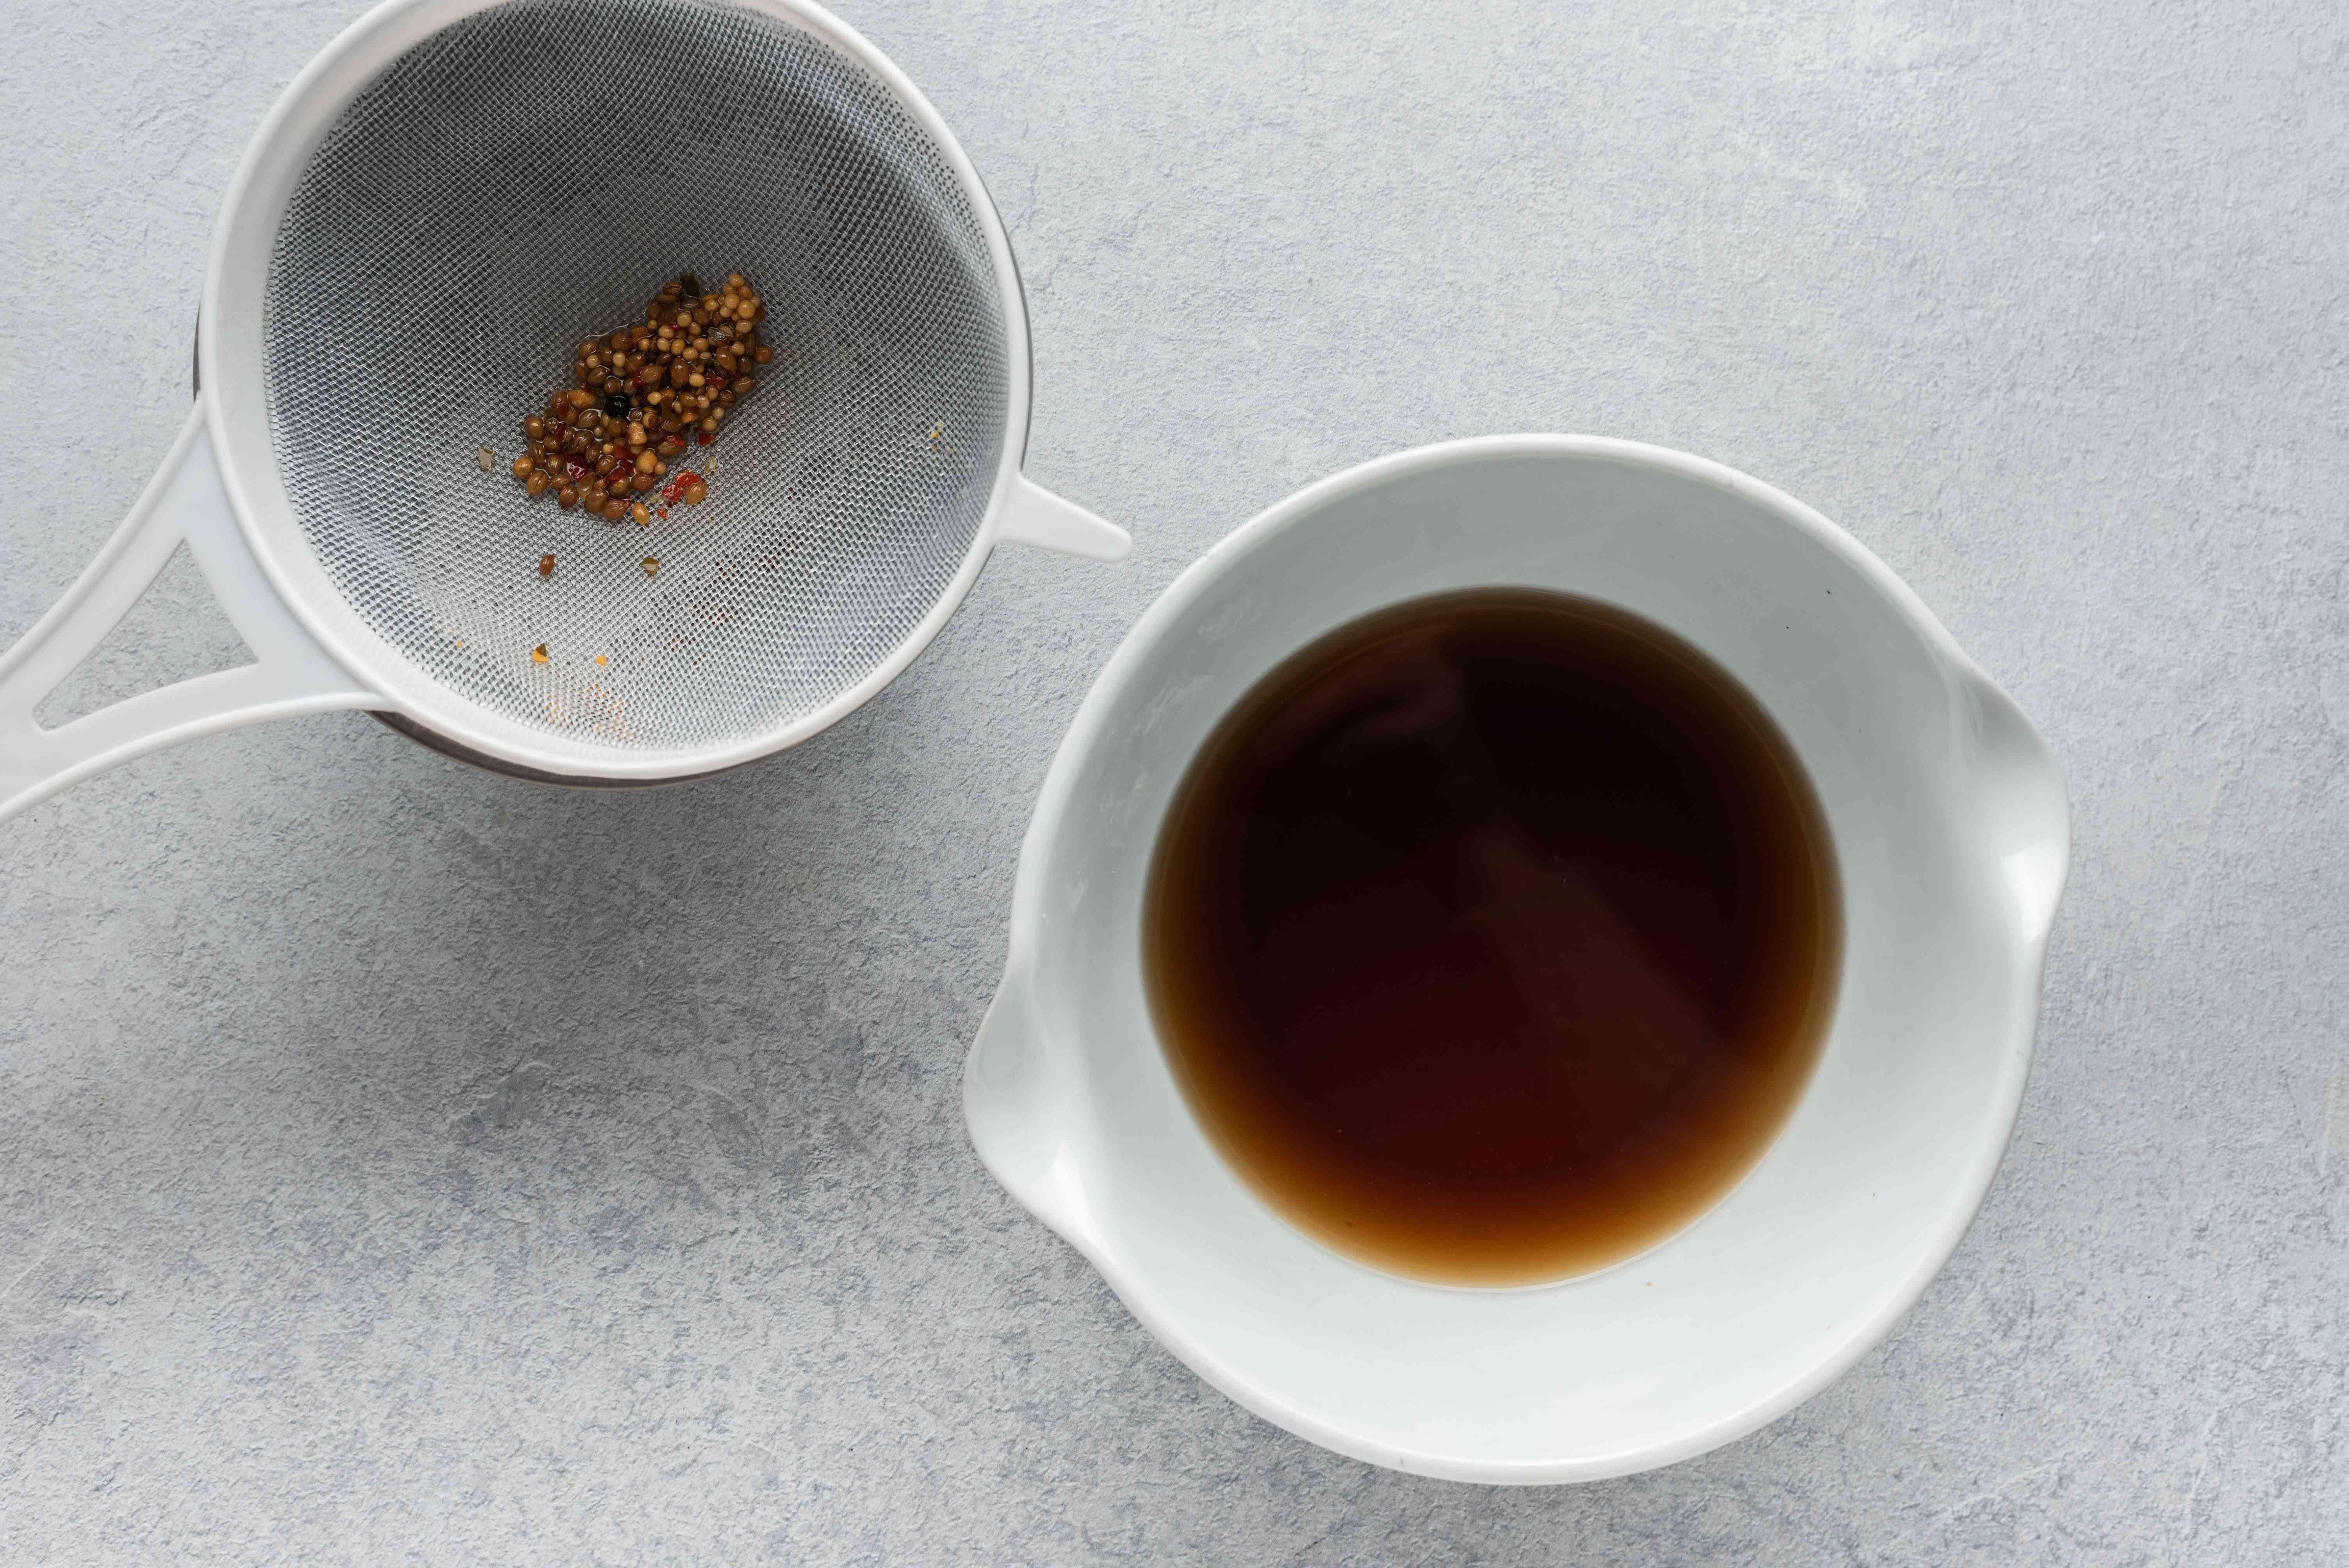 Strained spice vinegar